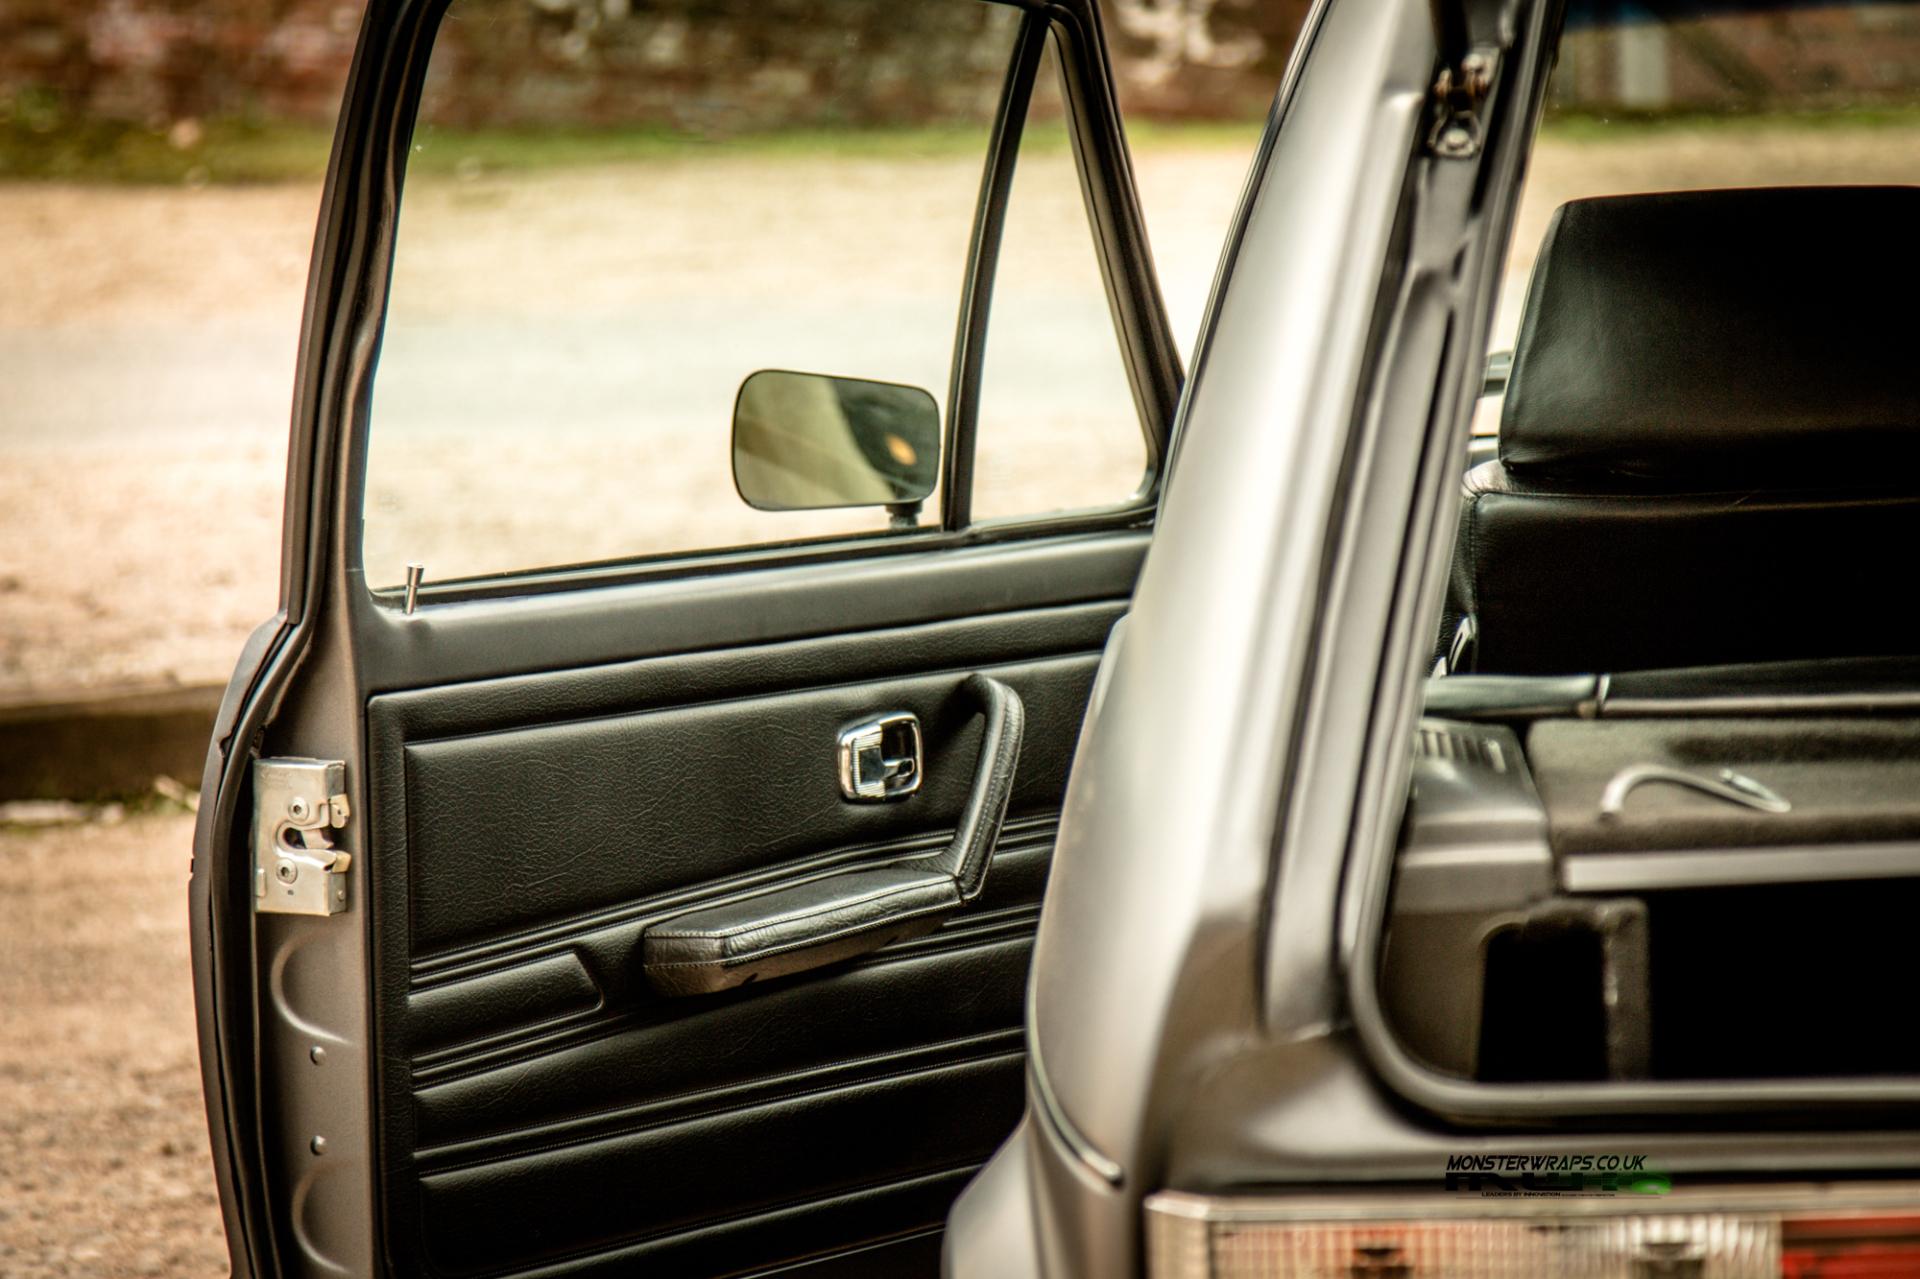 VW Golf mk1 matte dark grey full wrap 3M 1080 monsterwraps